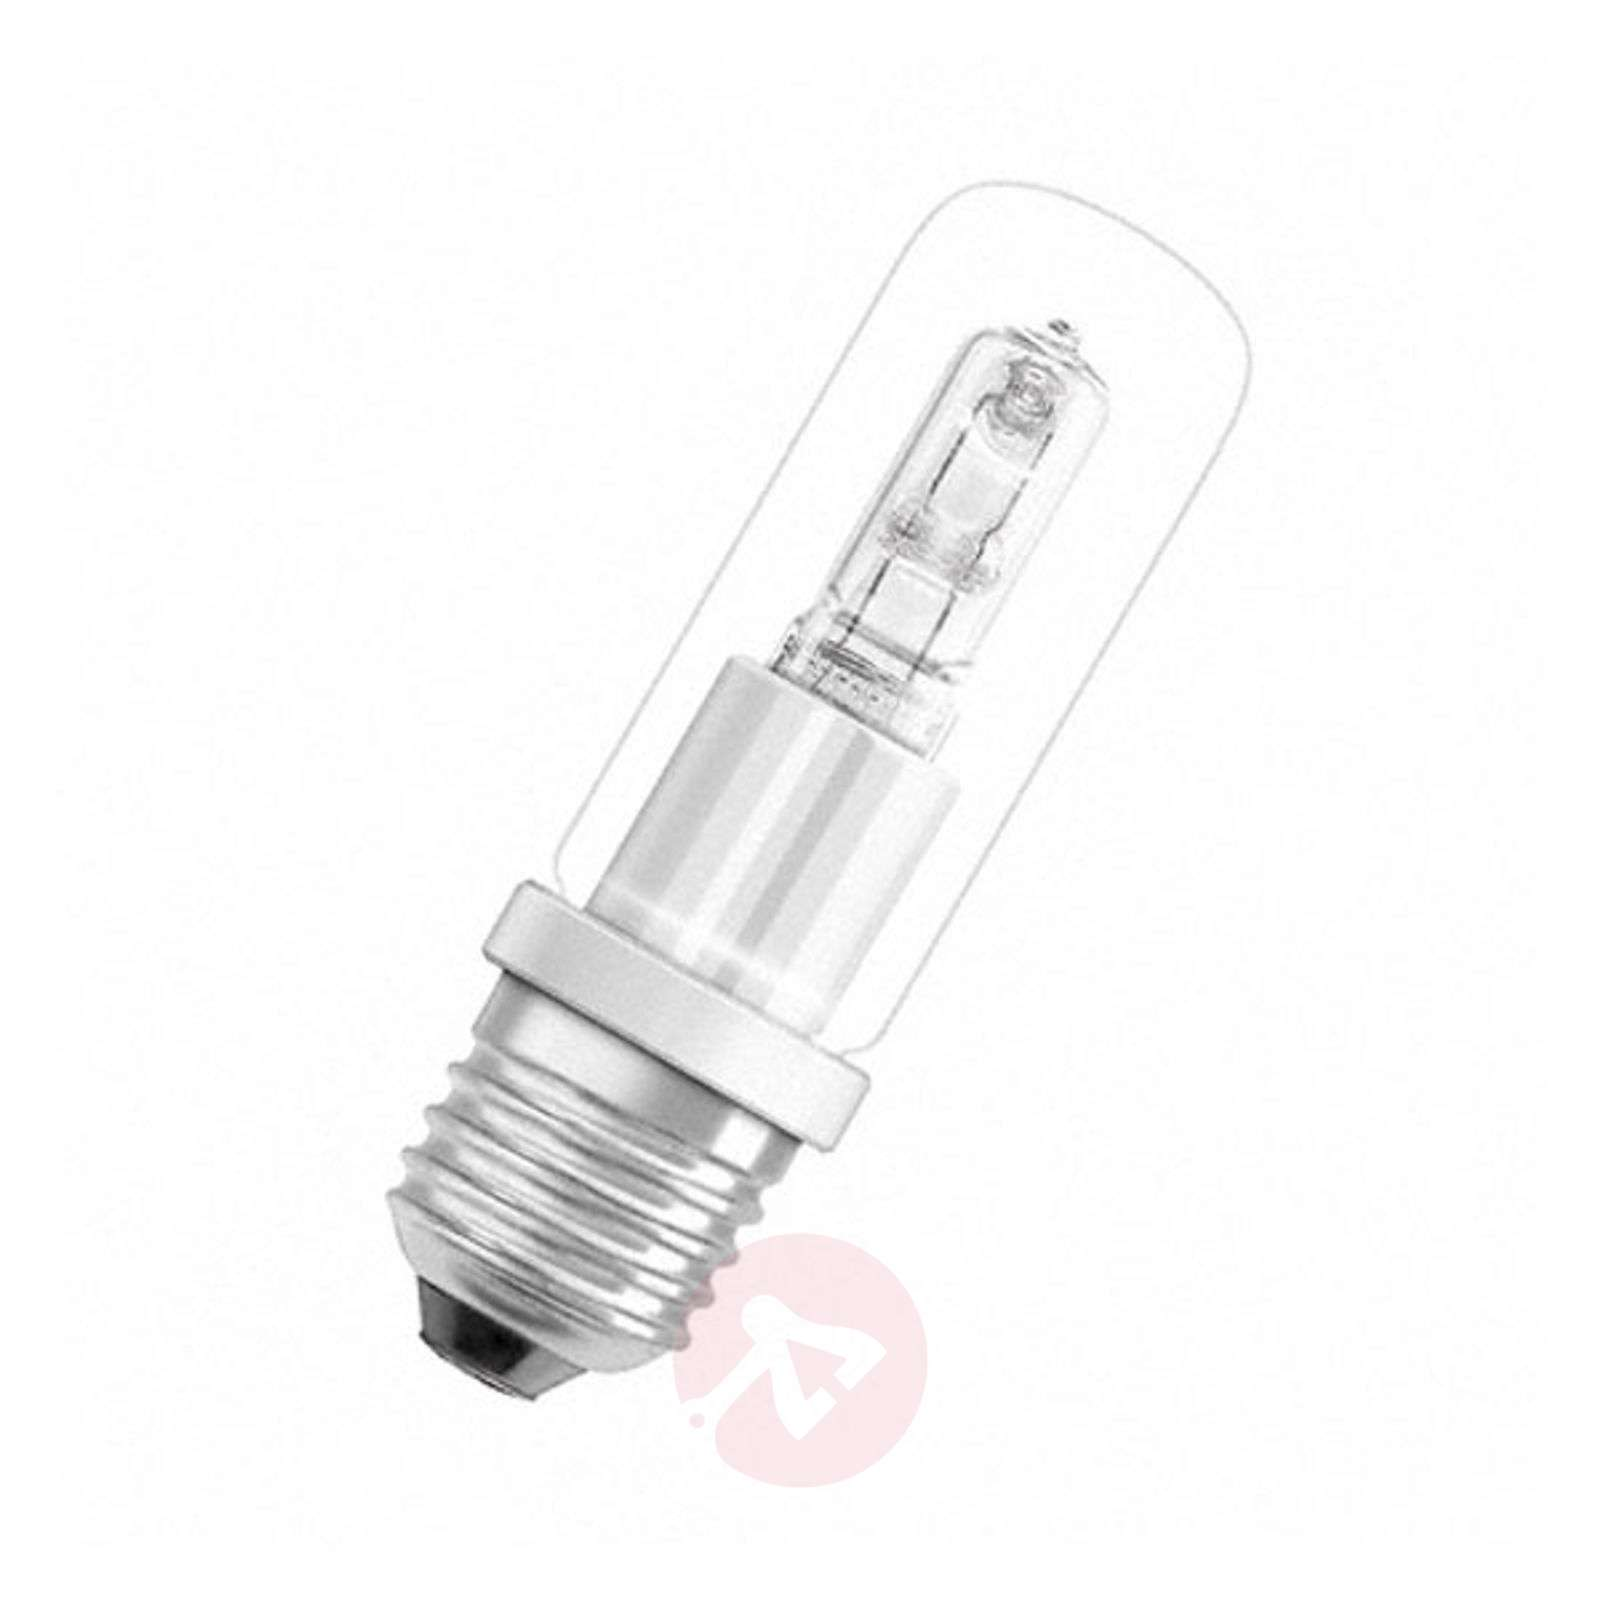 E27 70W Halolux Ceram kirkas – 20 % enem. lumen-7260285-01